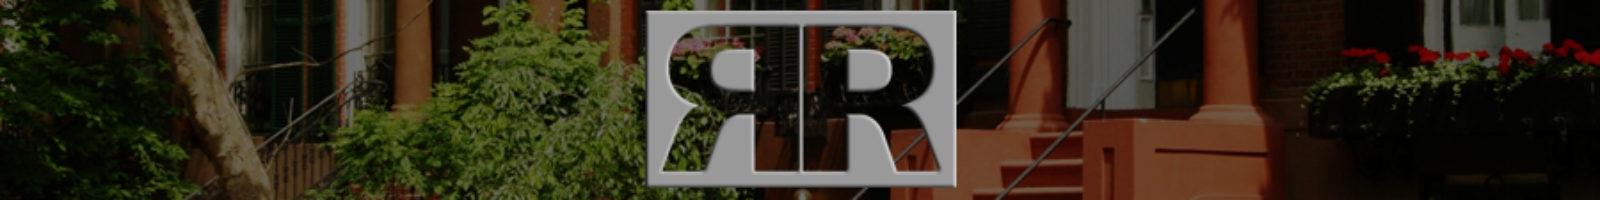 cropped-main-logo-1.jpg